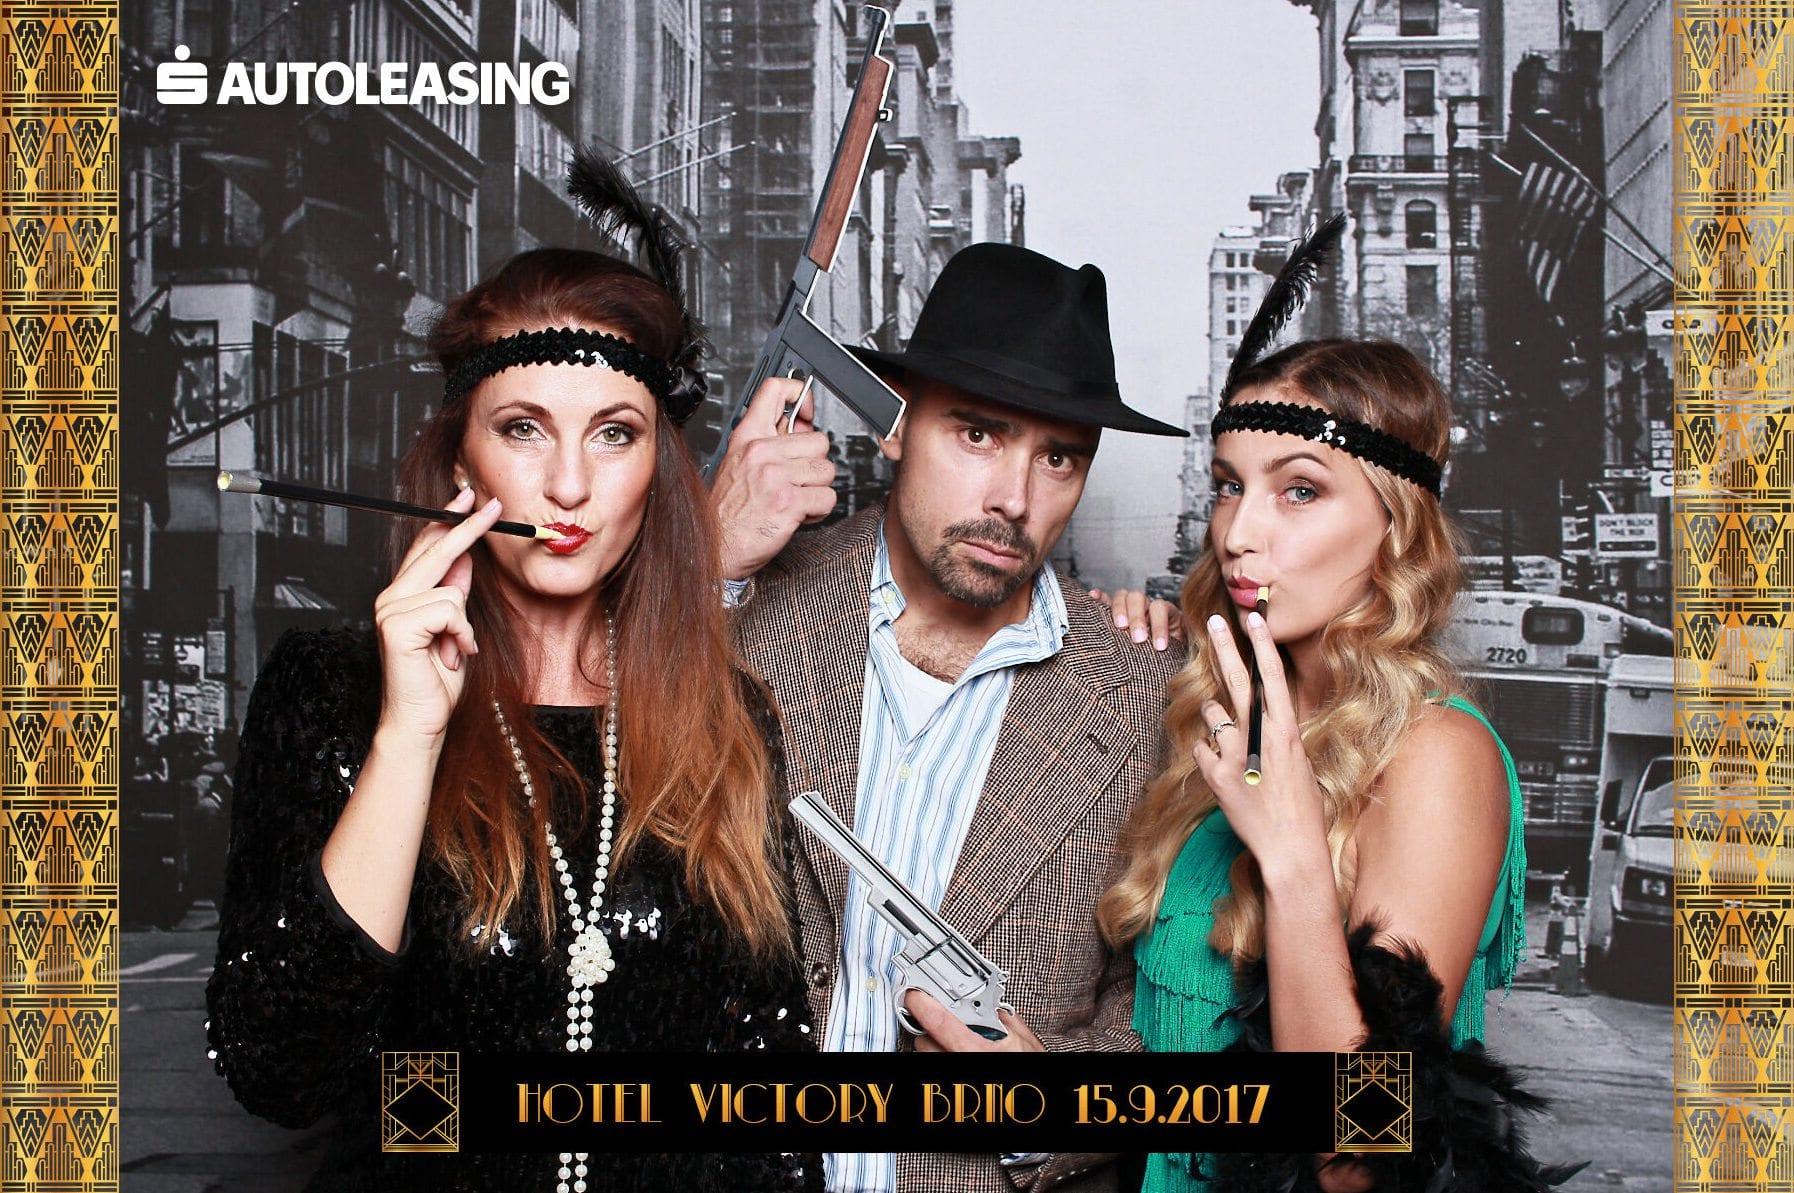 fotokoutek-autoleasing-hotel-victory-brno-15-9-2017-313235